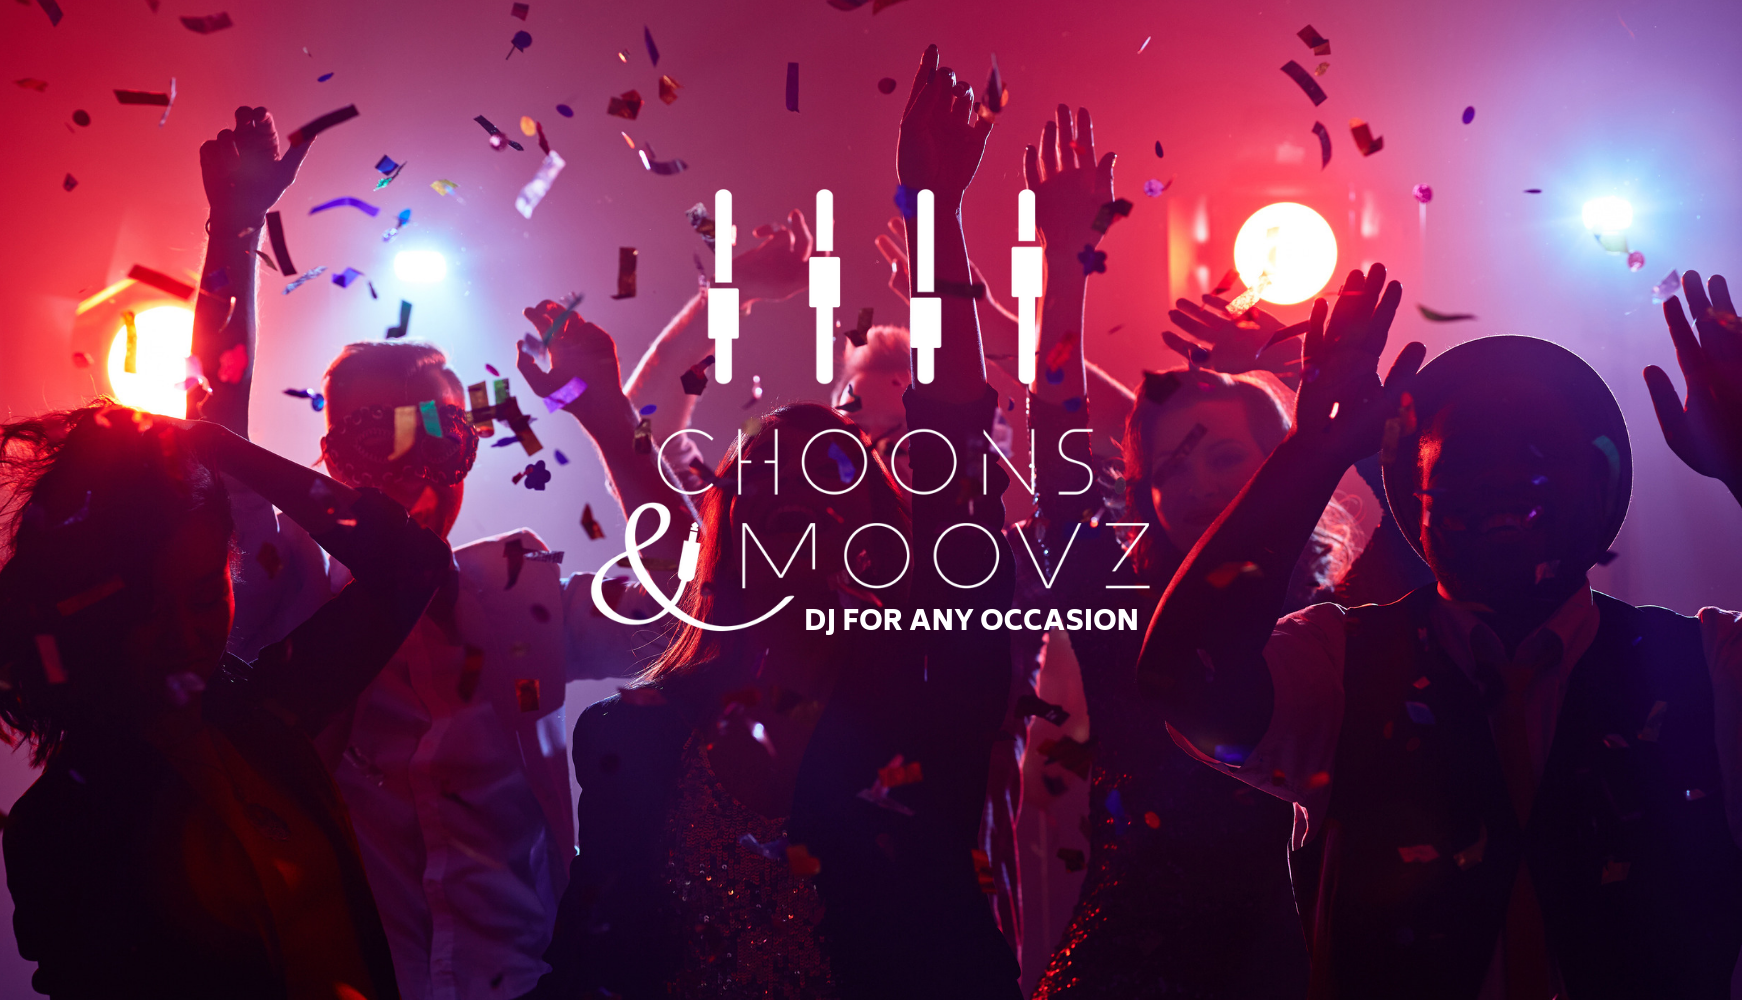 Choonz&Moovz